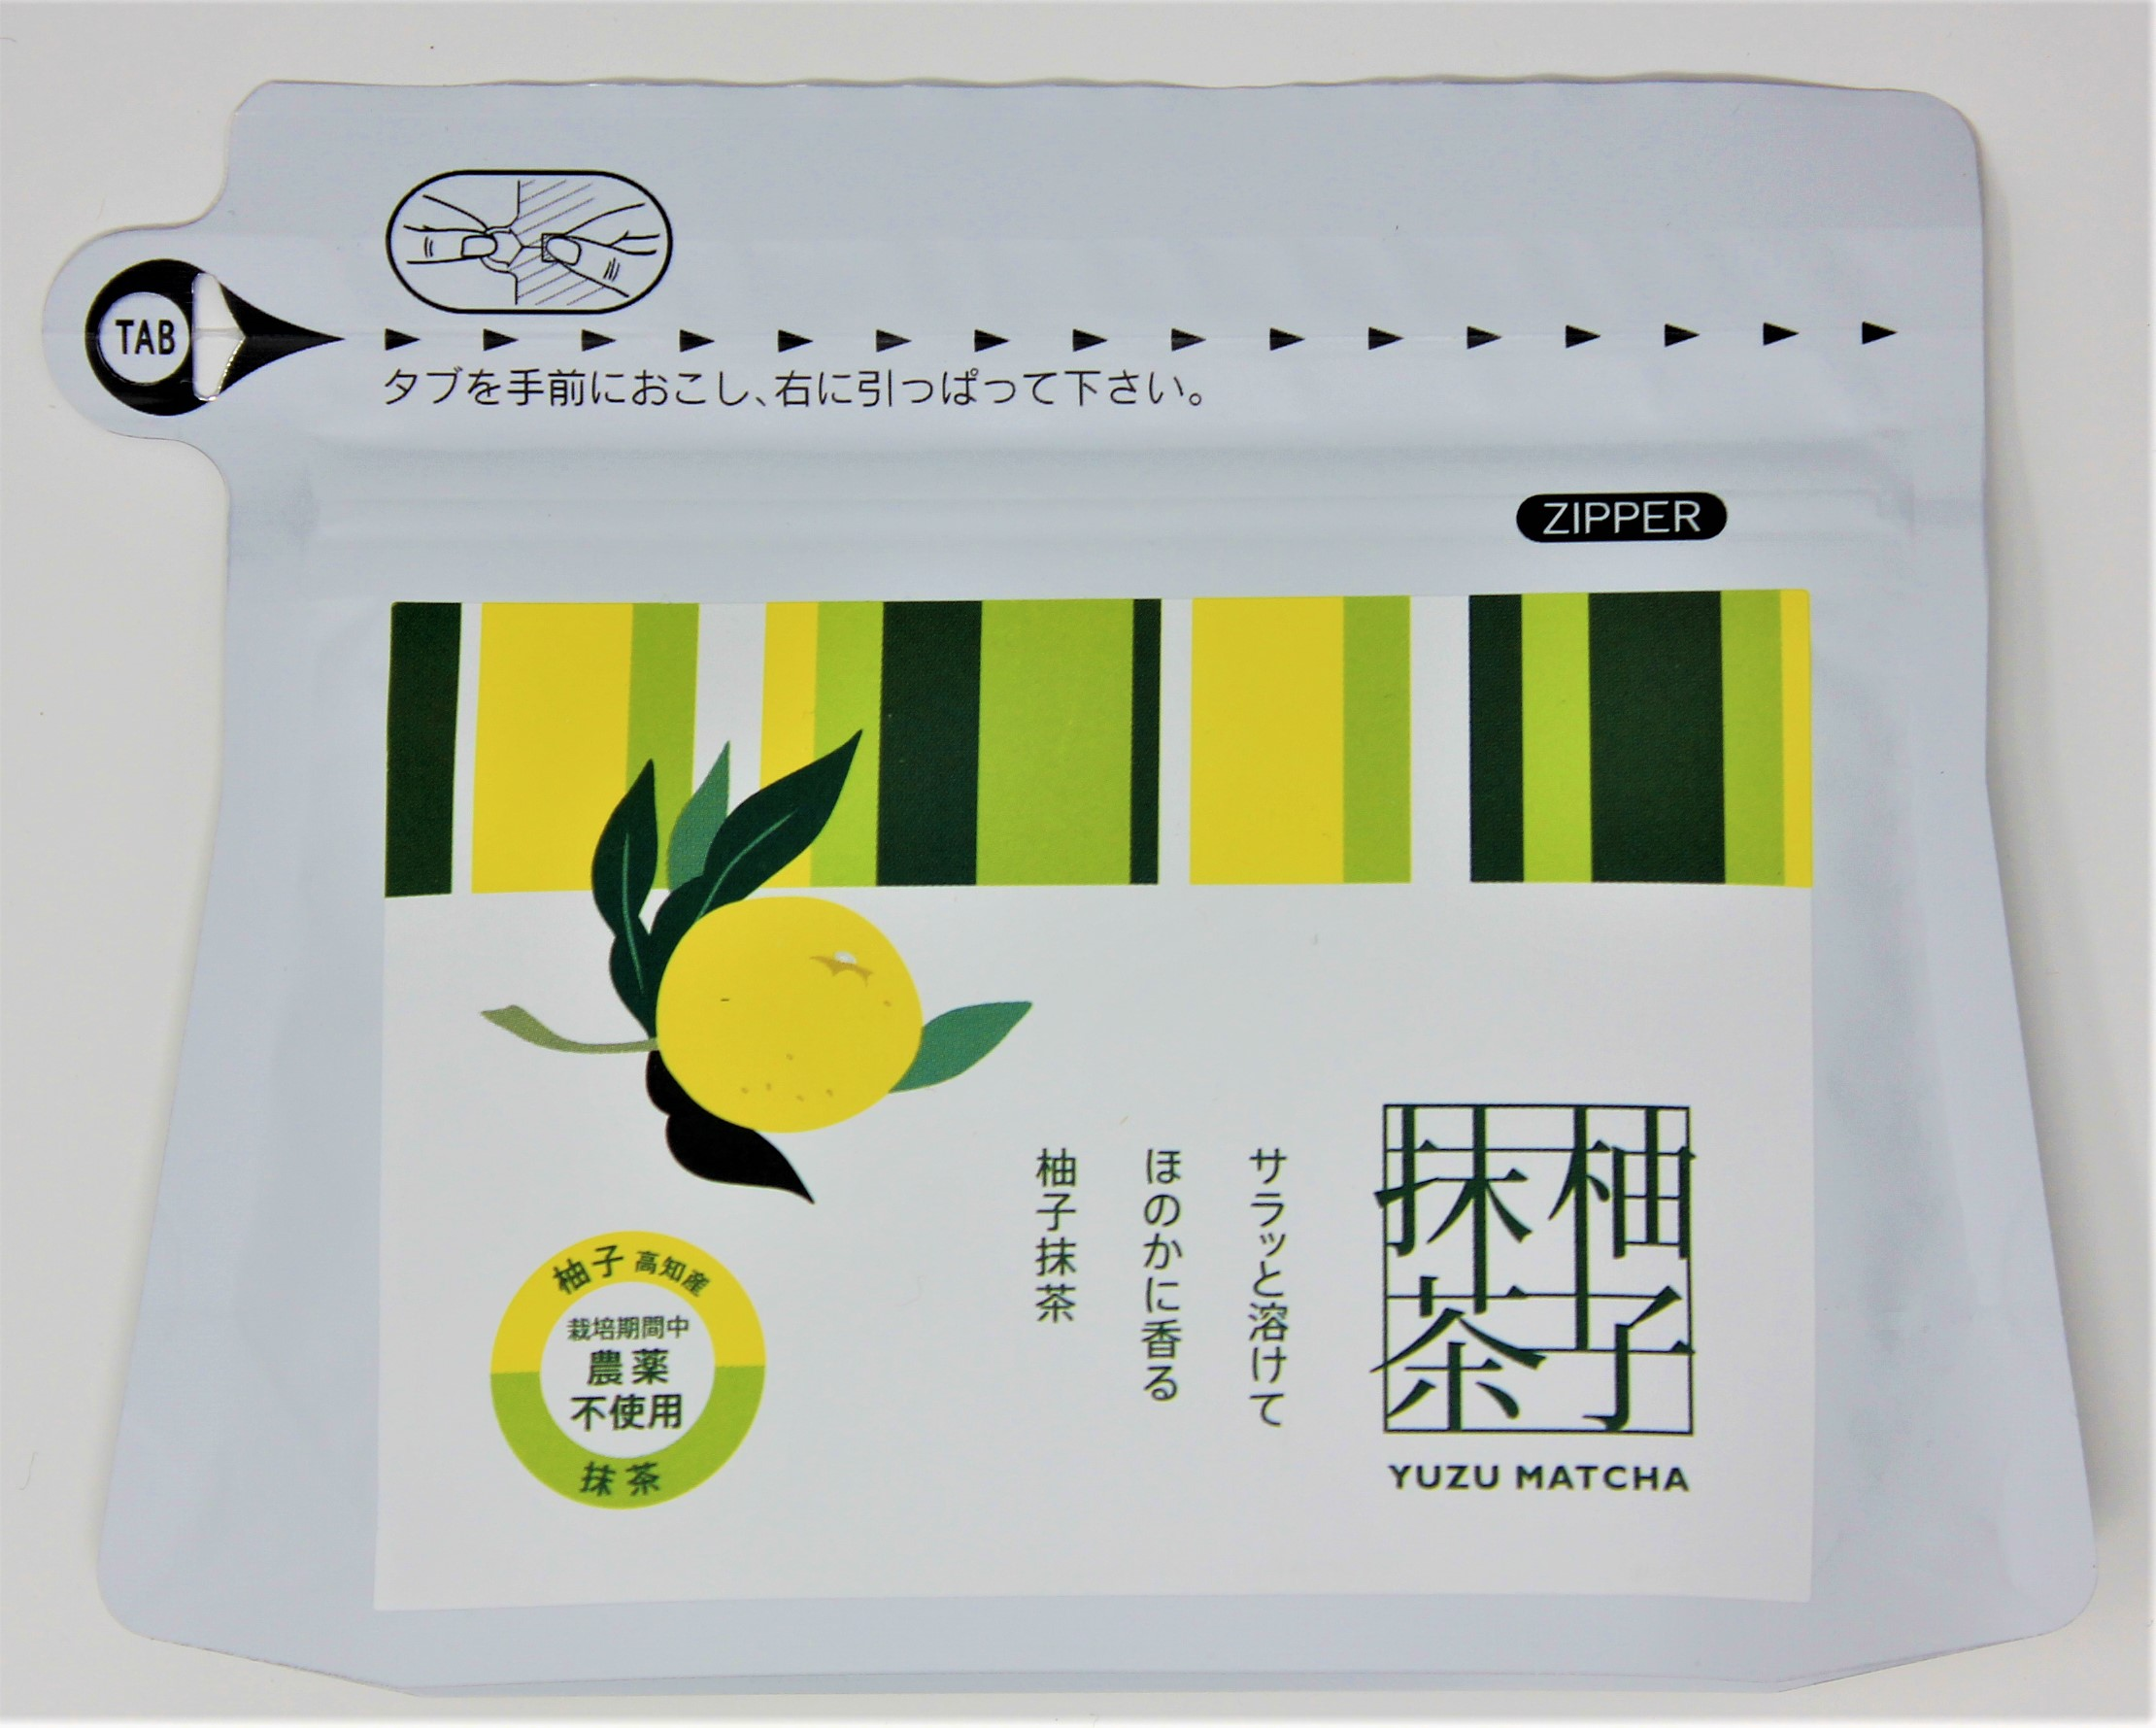 yuzu matcha package 2